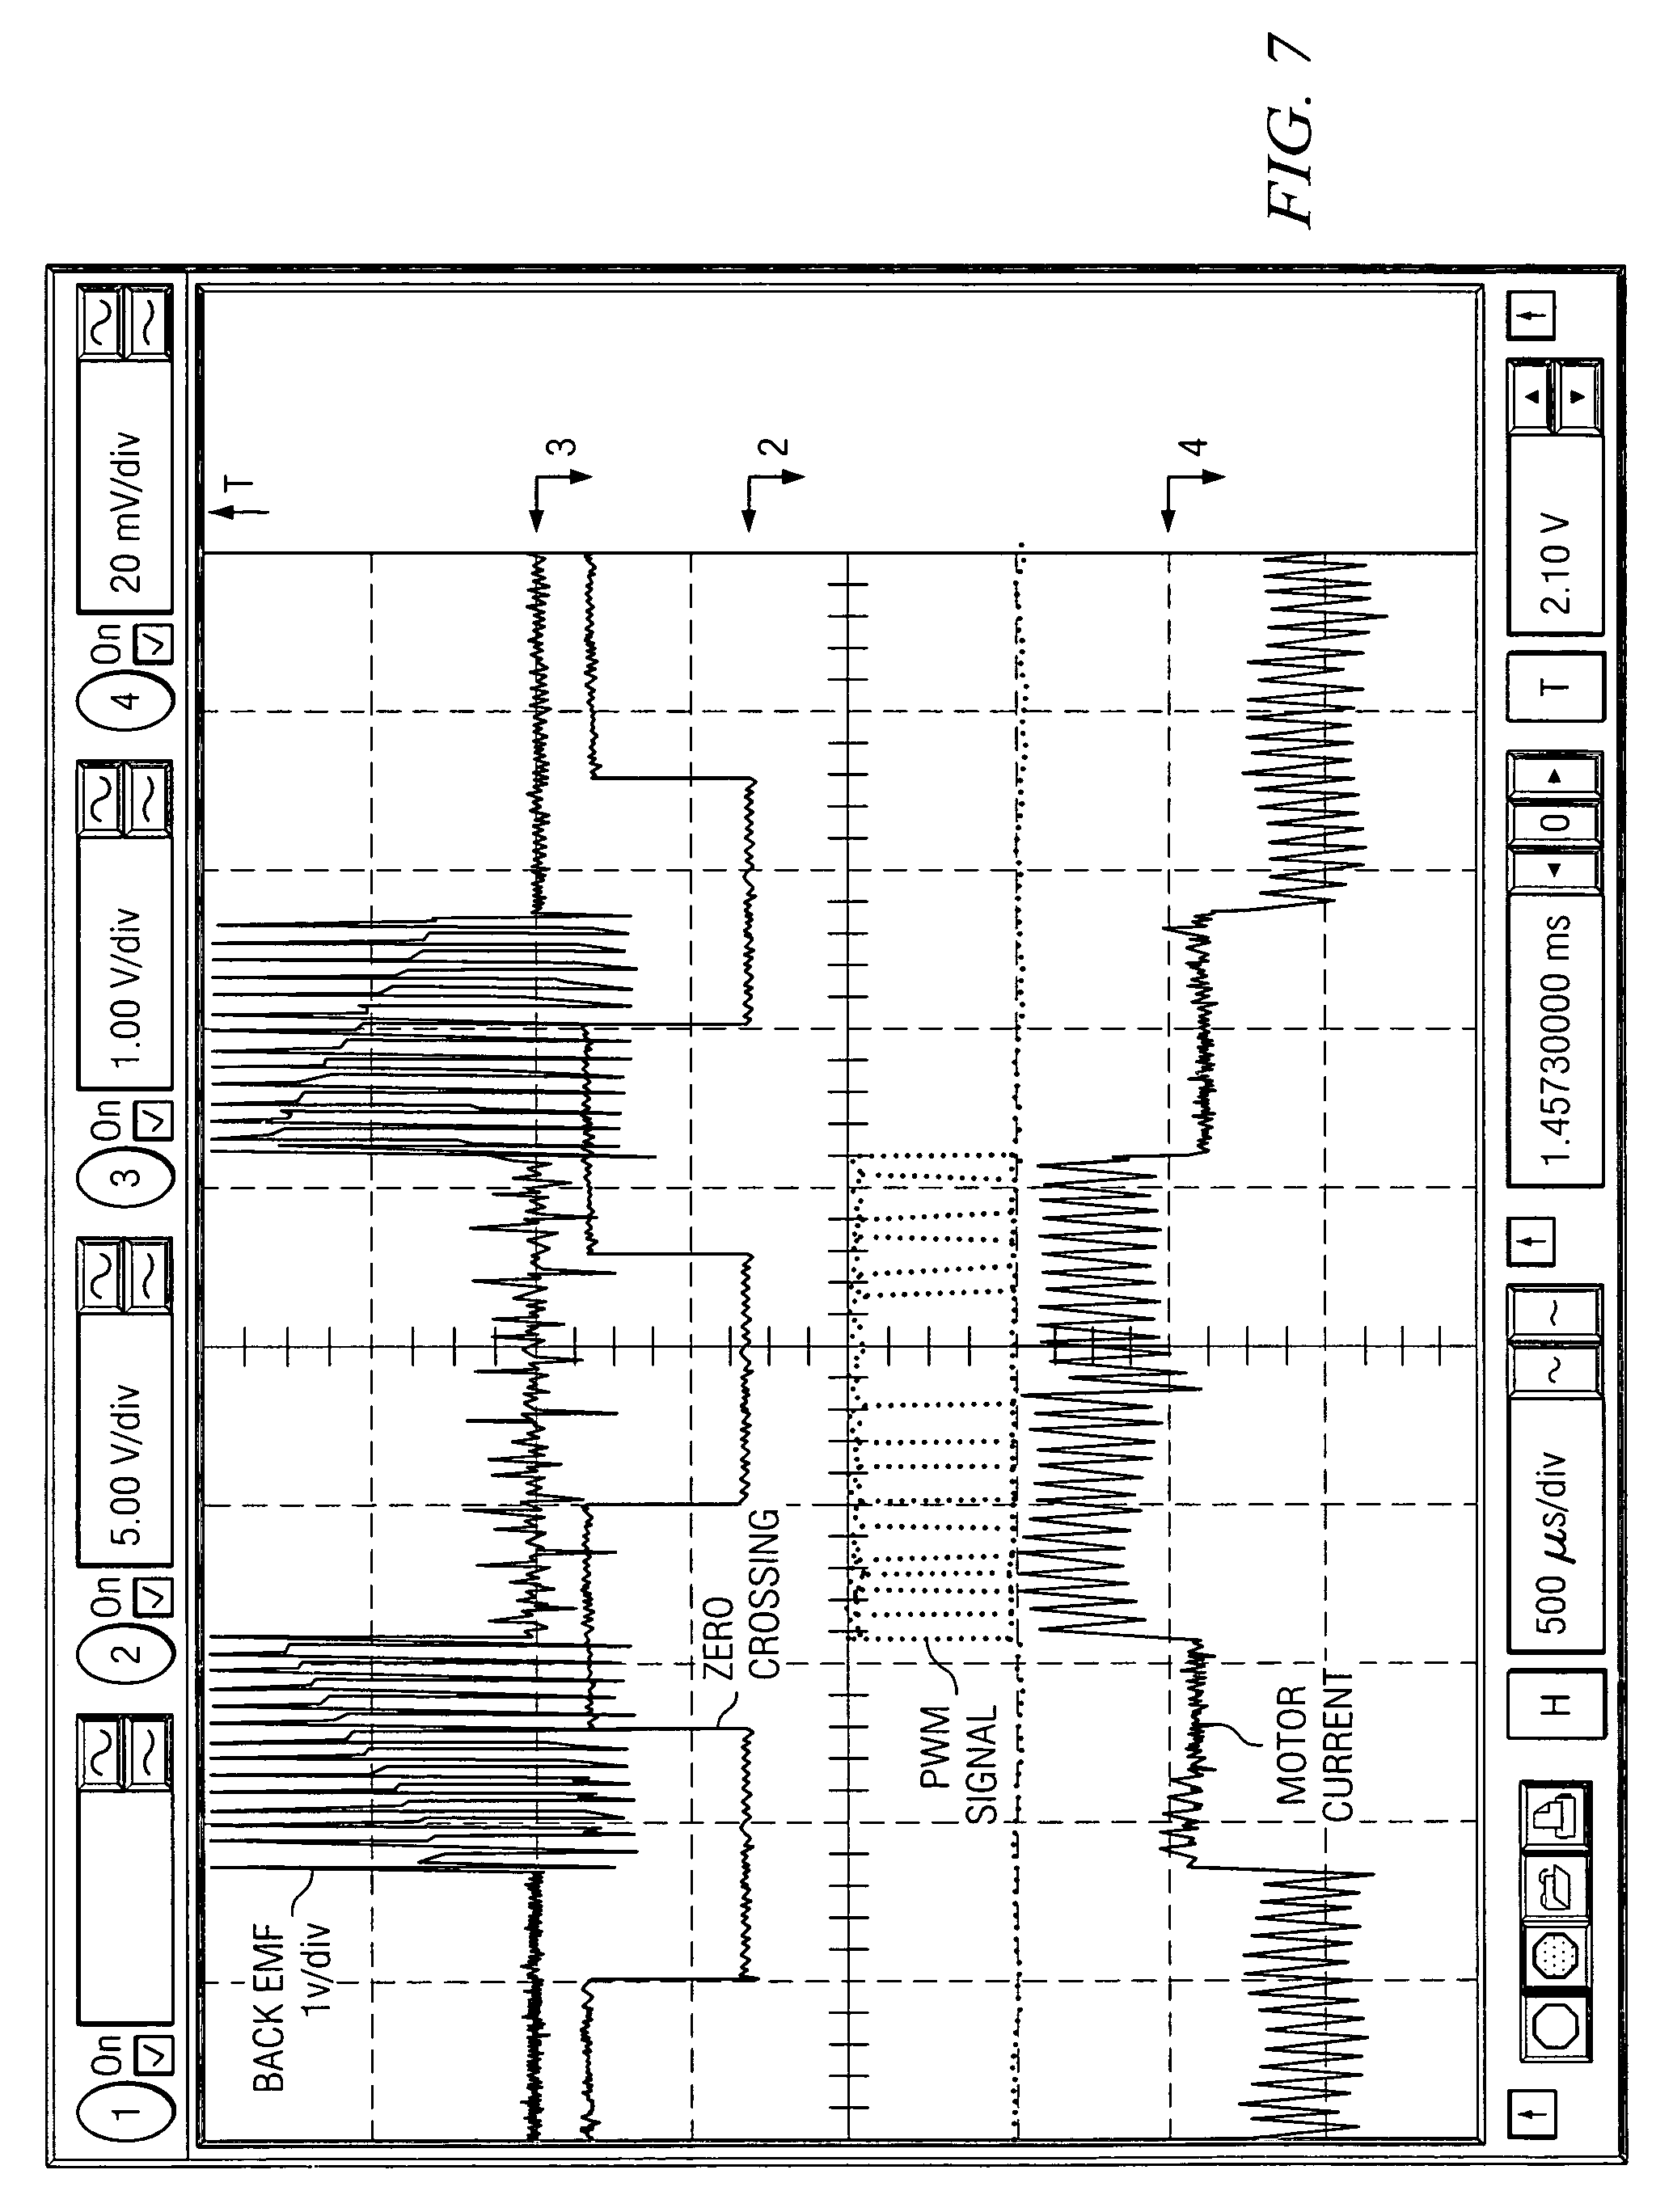 Sensorless pmsm thesis